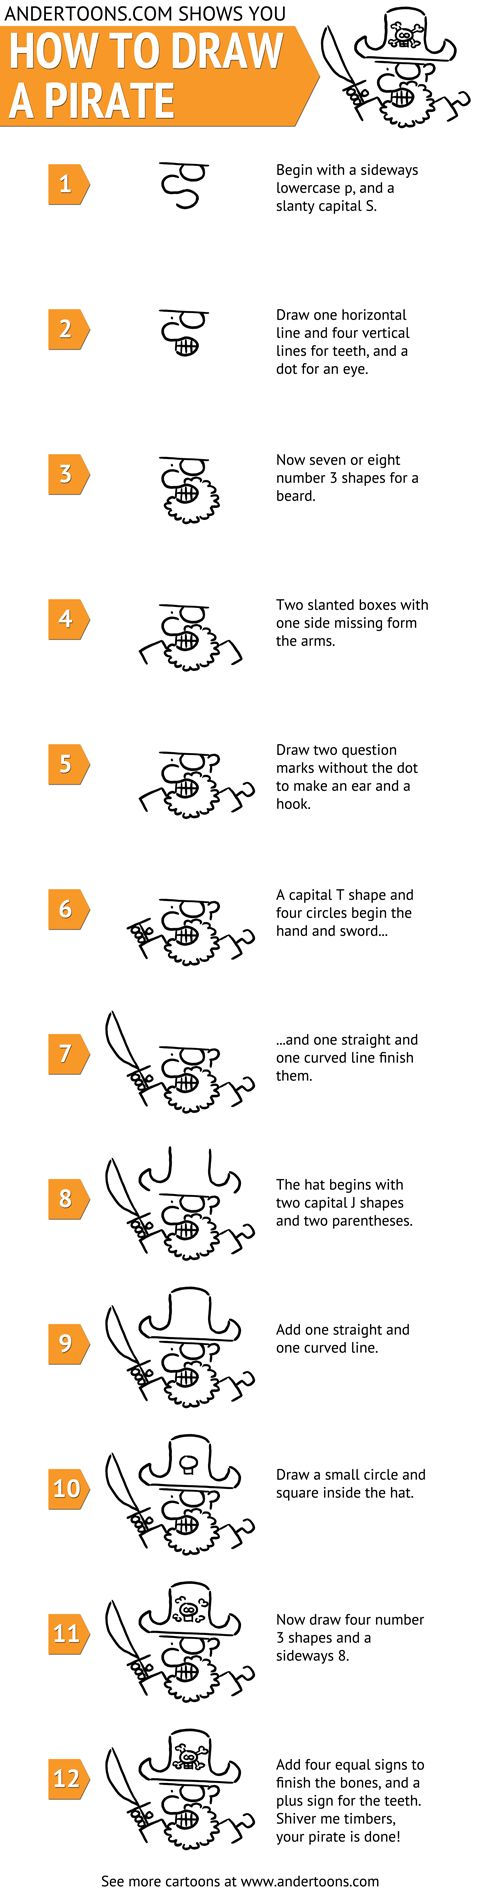 ¿Cómo dibujar un pirata?